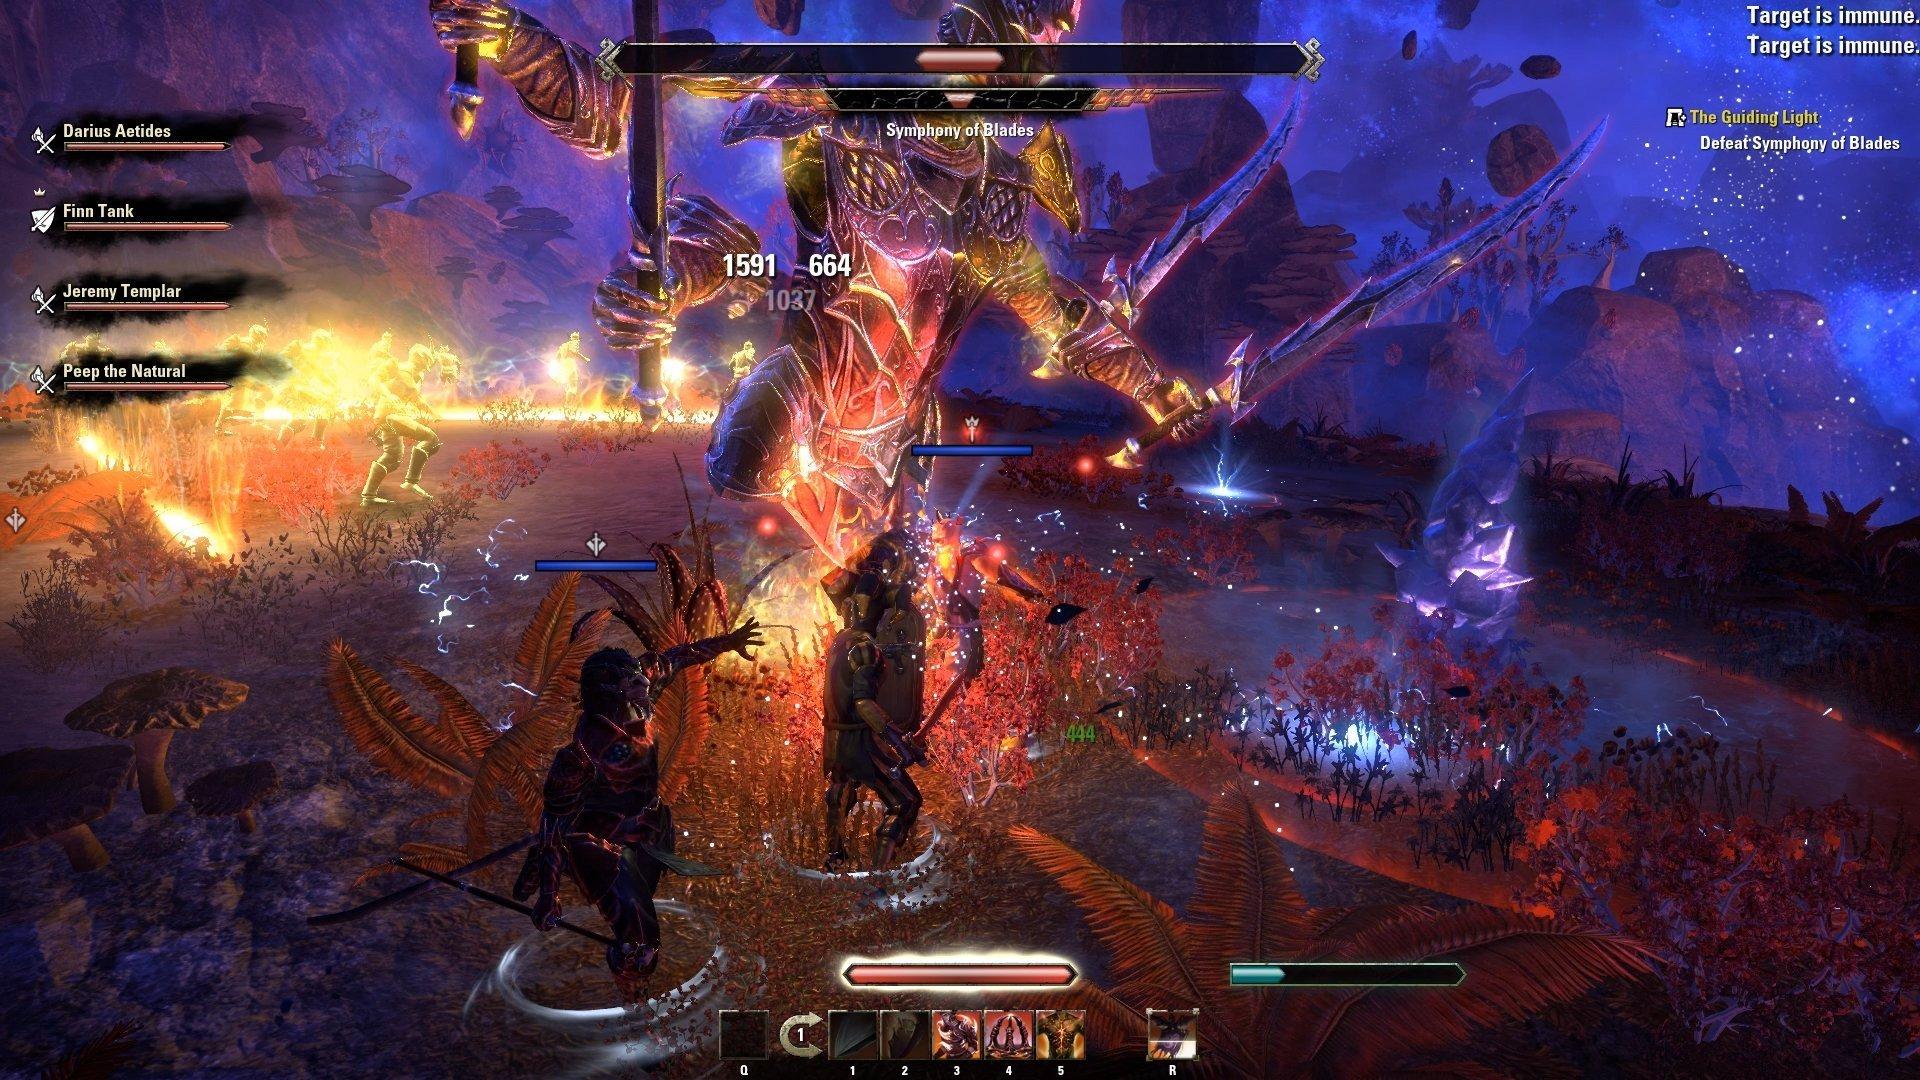 The Elder Scrolls Online - Wrathstone - Symphony